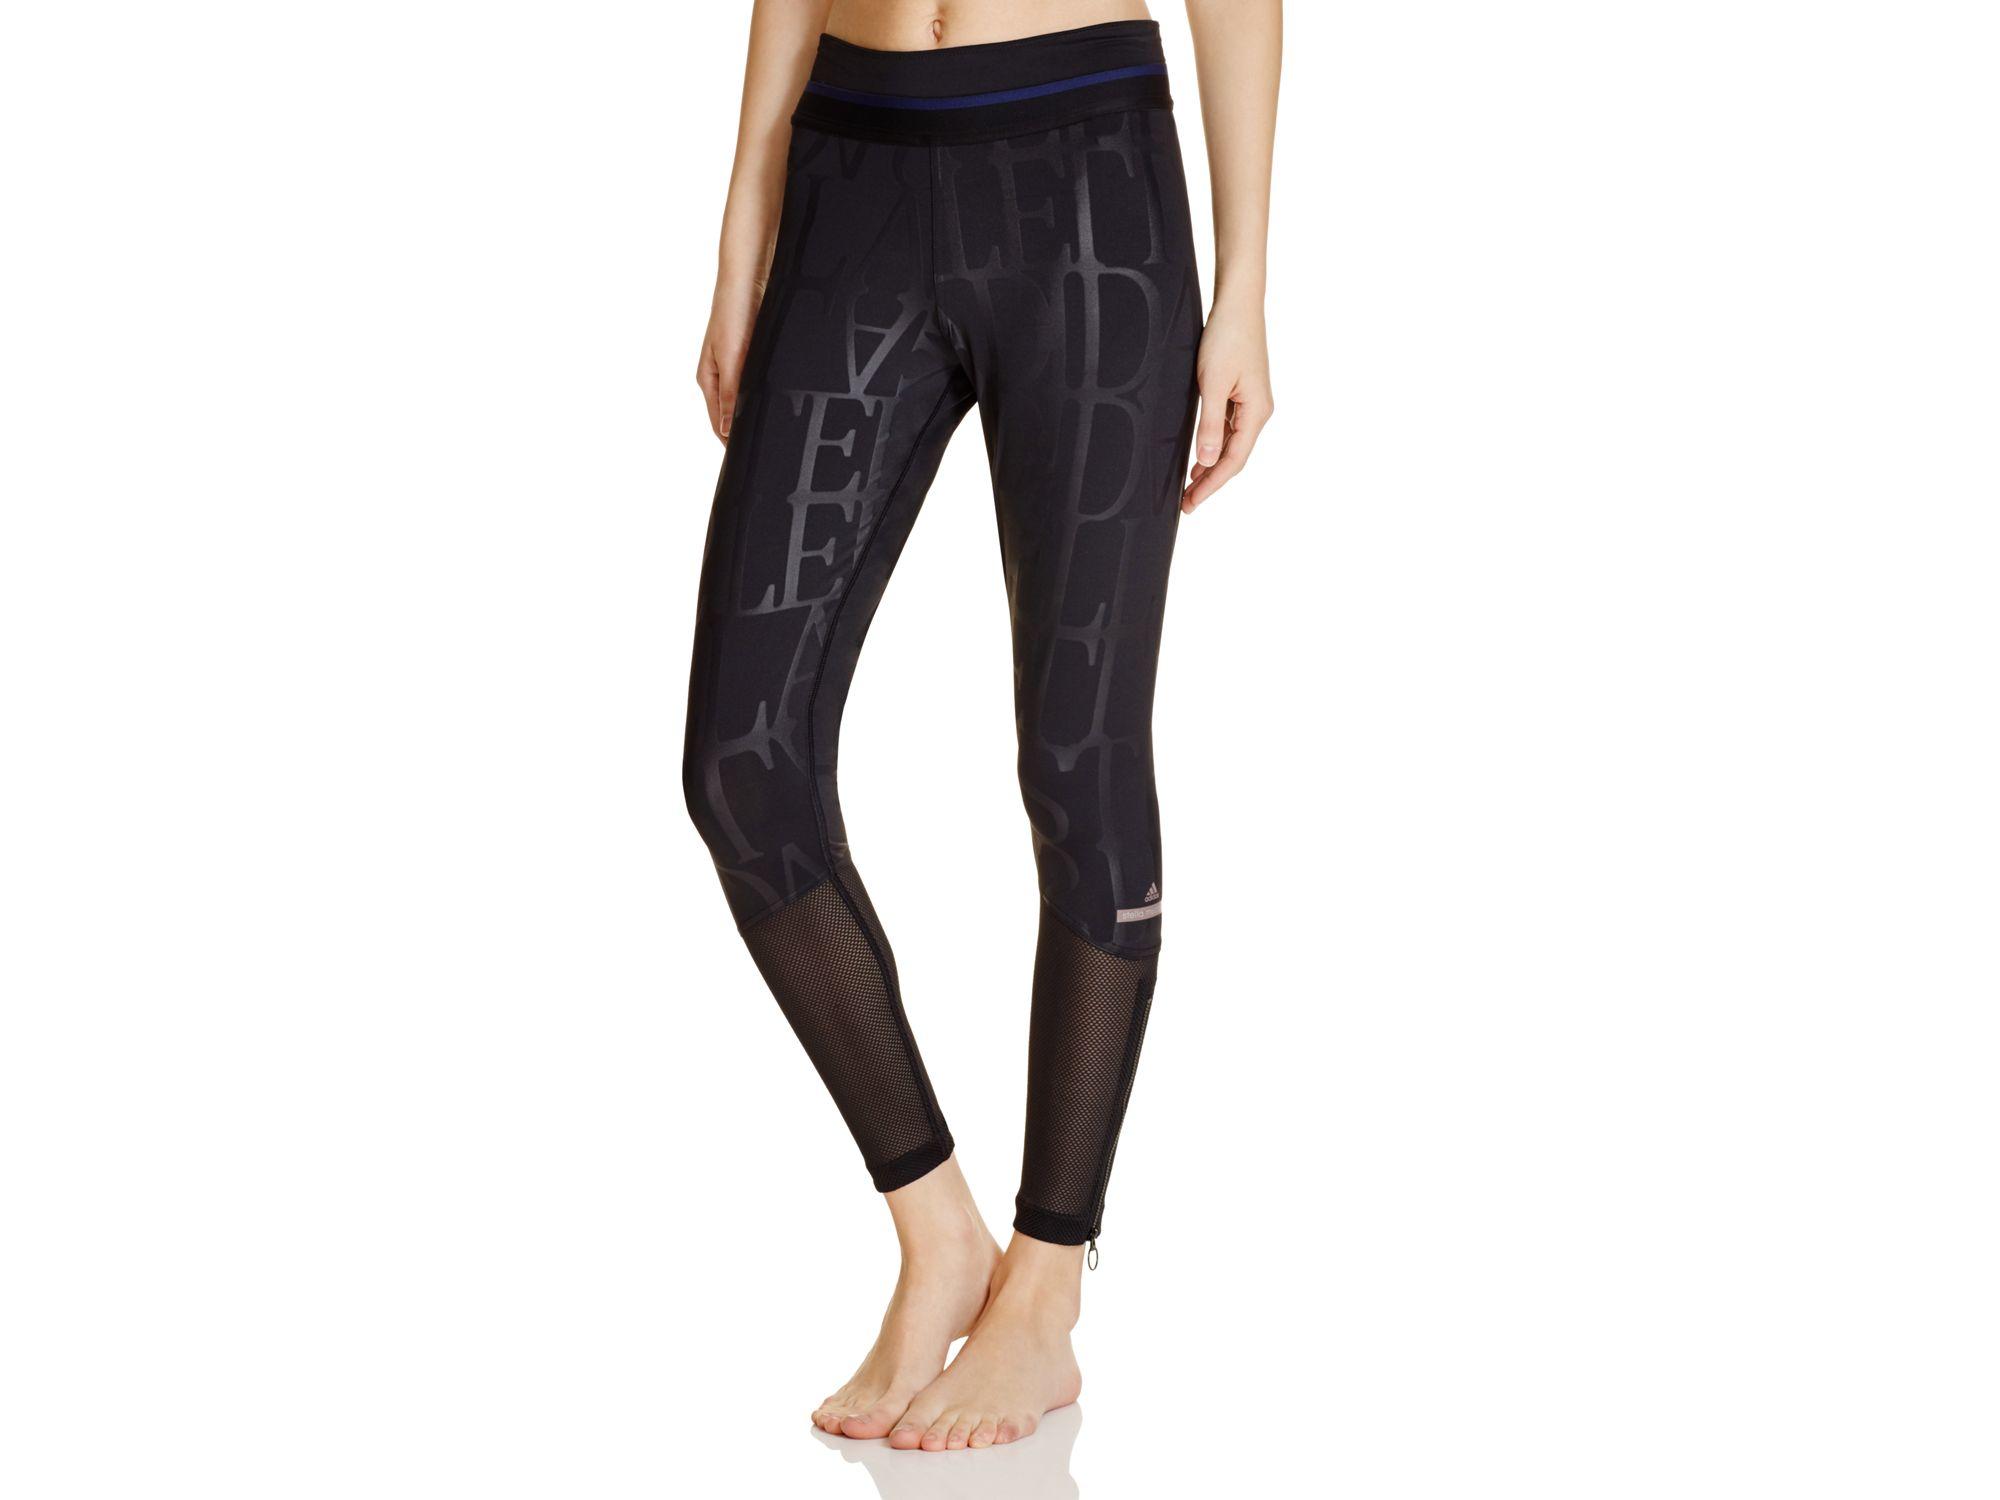 lyst adidas by stella mccartney run long tight leggings. Black Bedroom Furniture Sets. Home Design Ideas